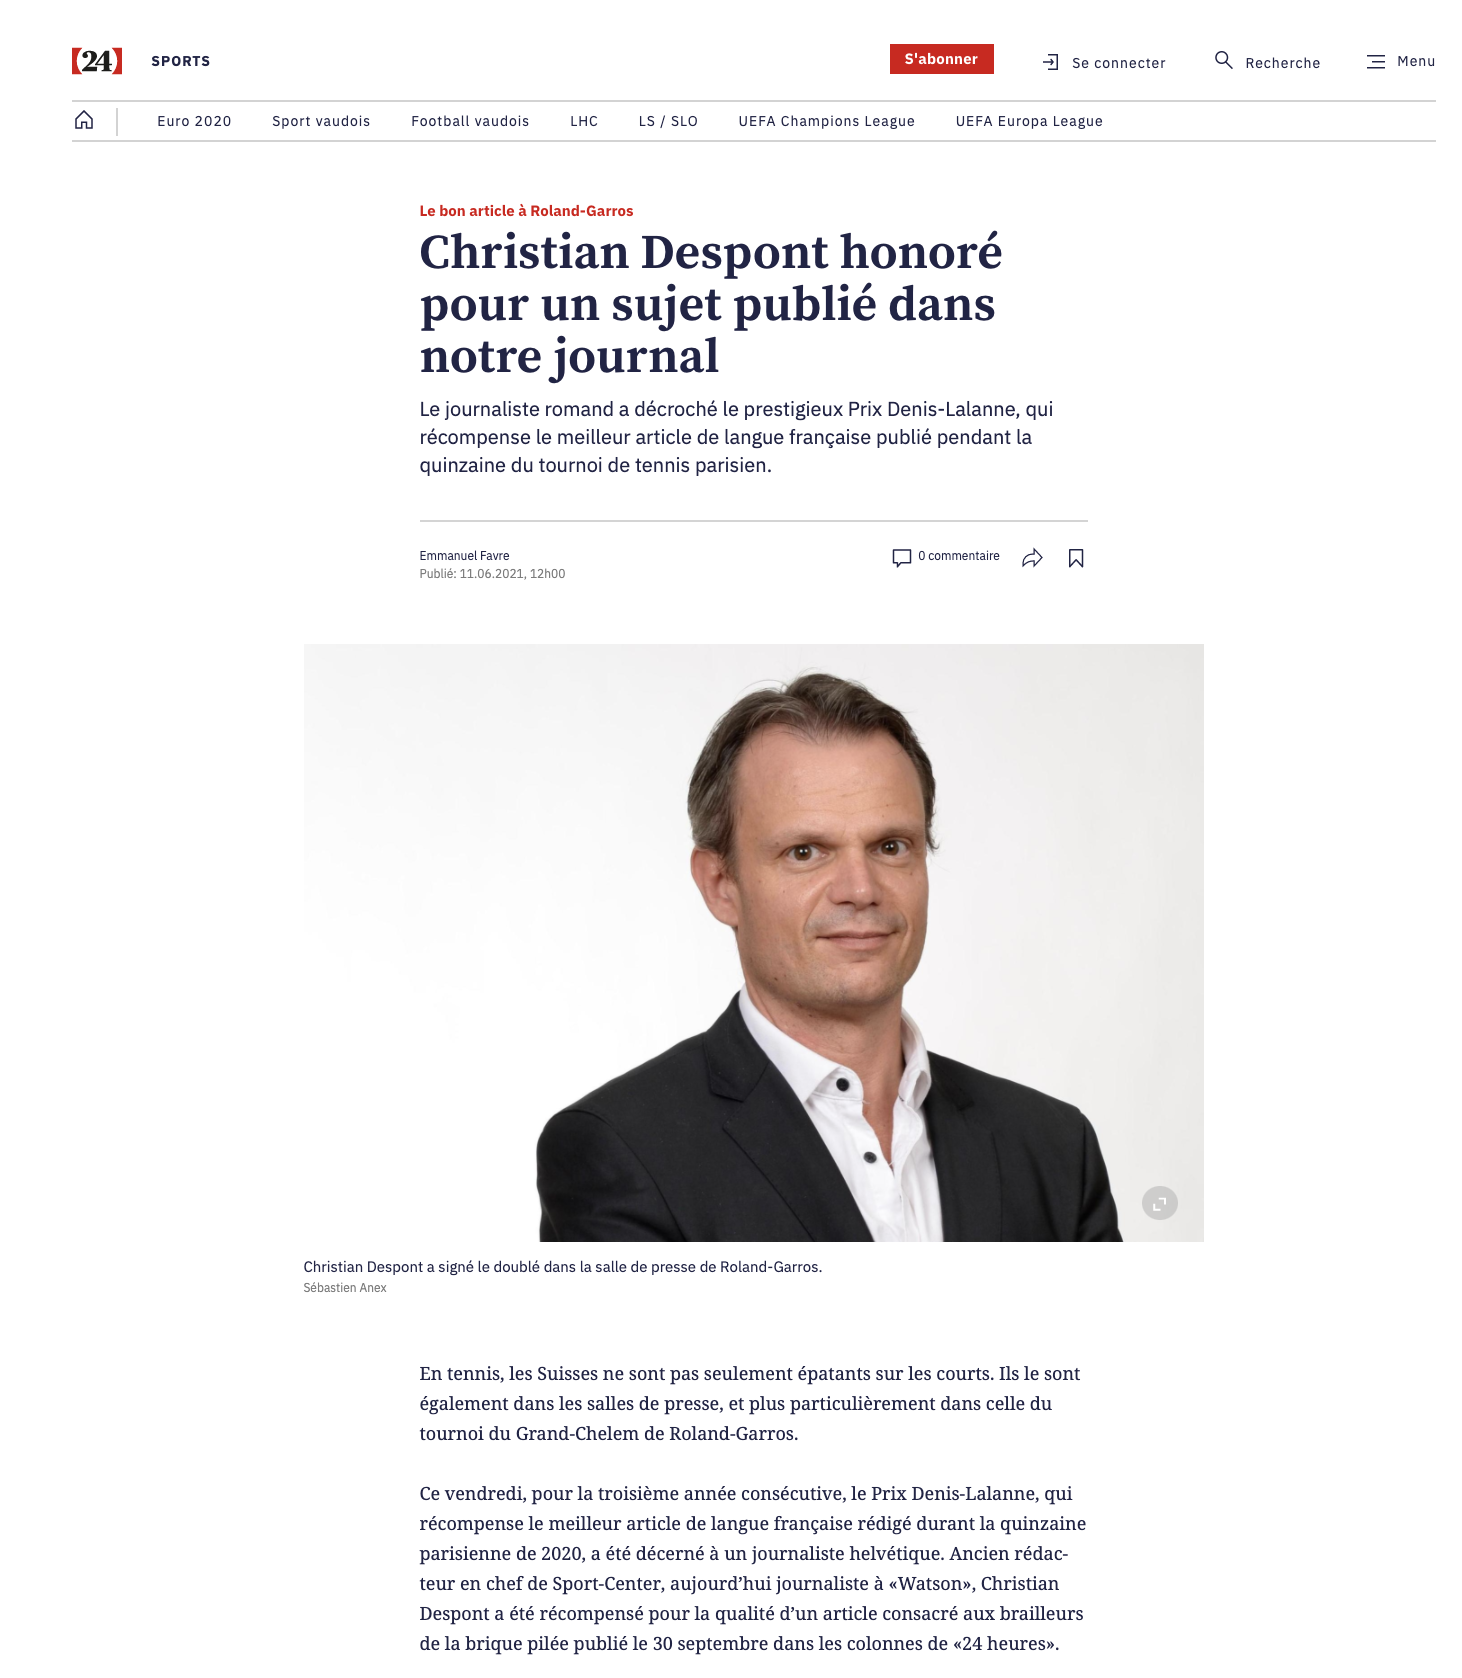 24 Heures Prix Denis-Lalanne